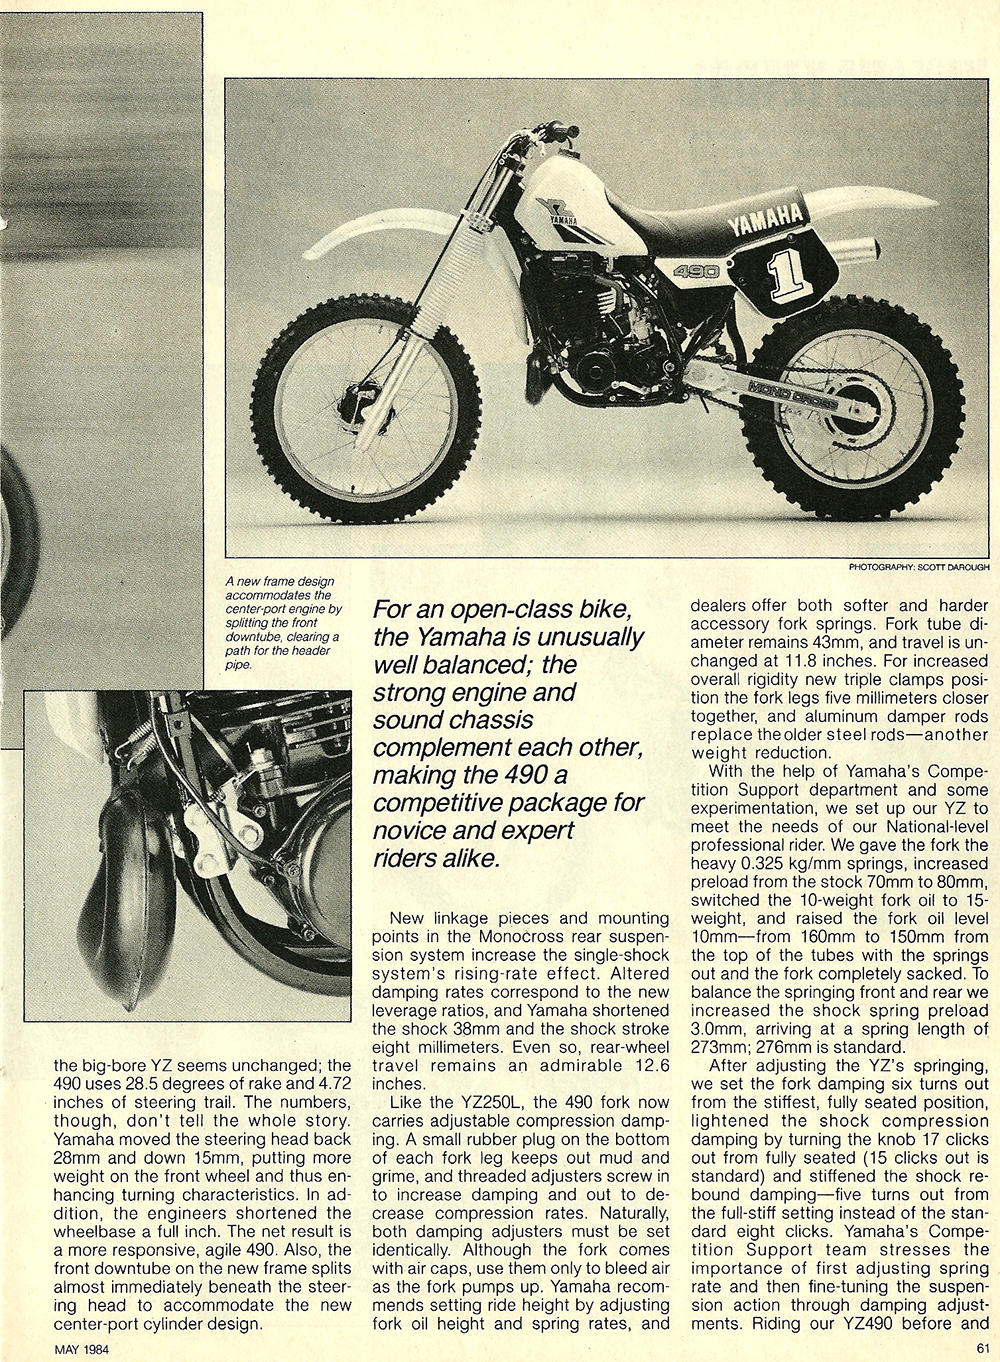 1984 Yamaha YZ490L off road test 4.jpg